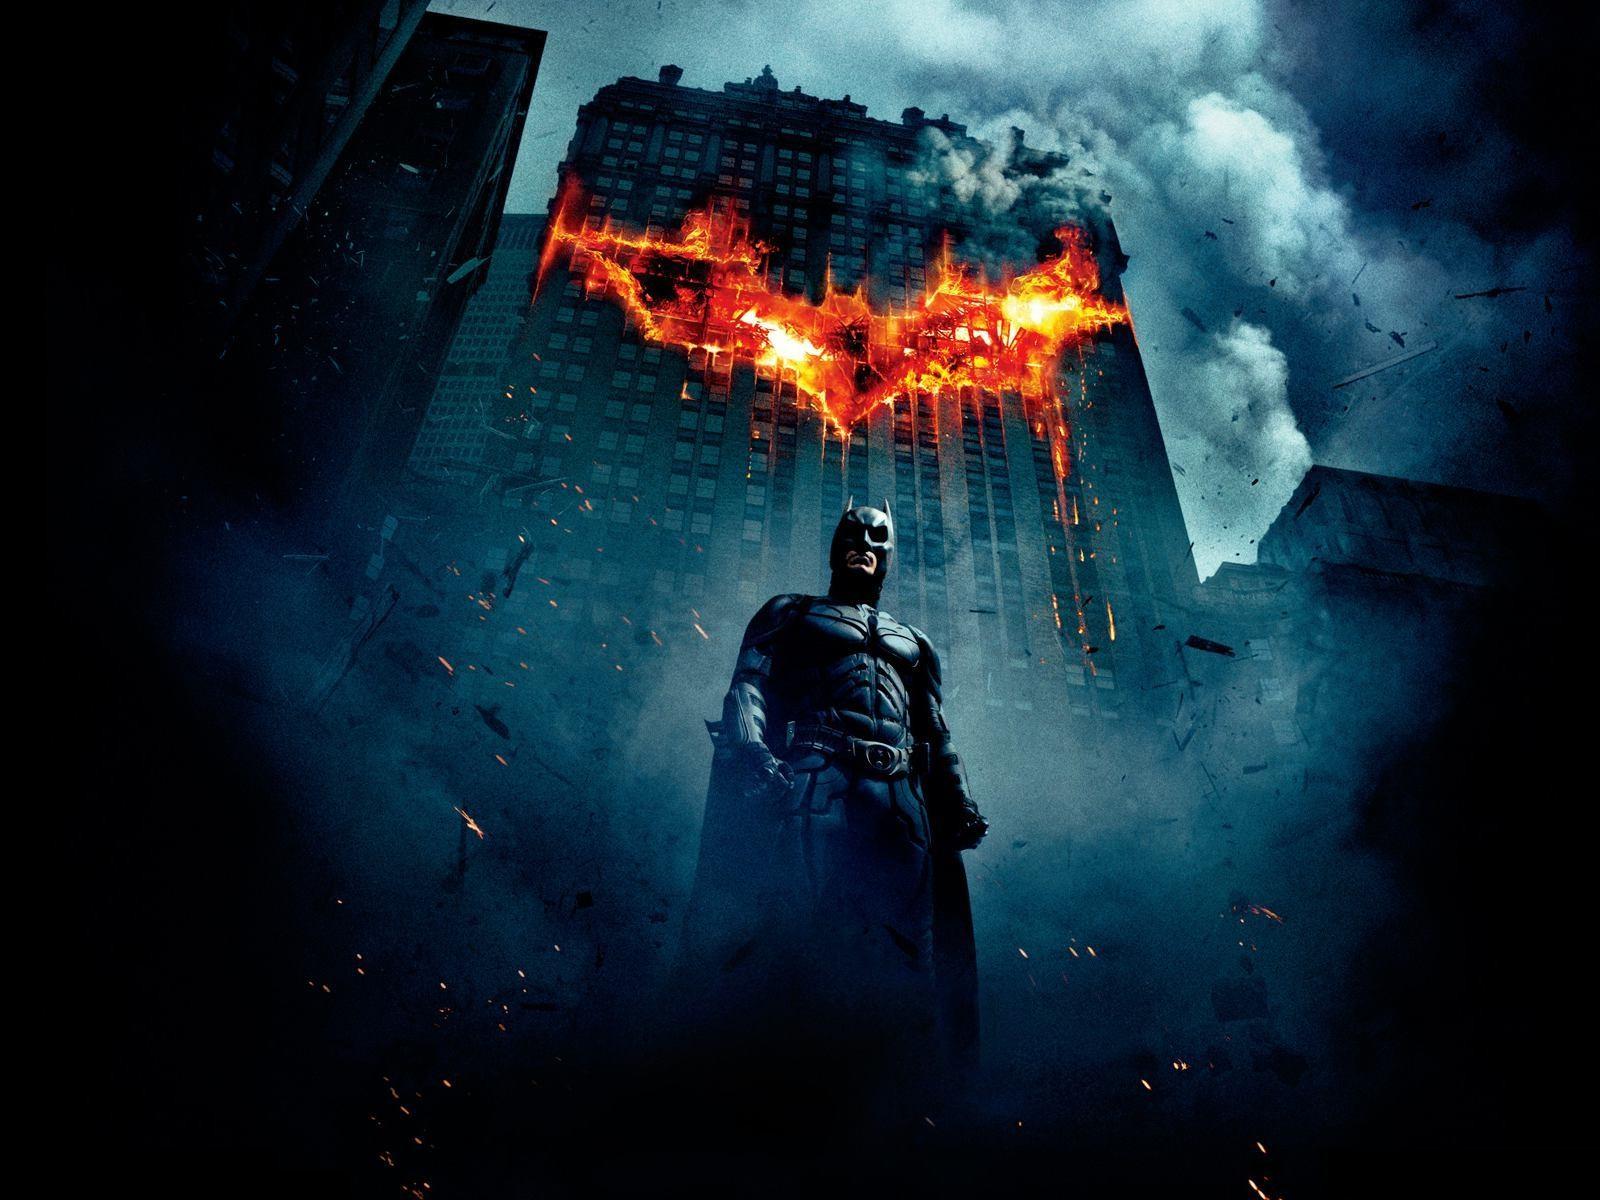 The Dark Knight desktop wallpaper 1600x1200